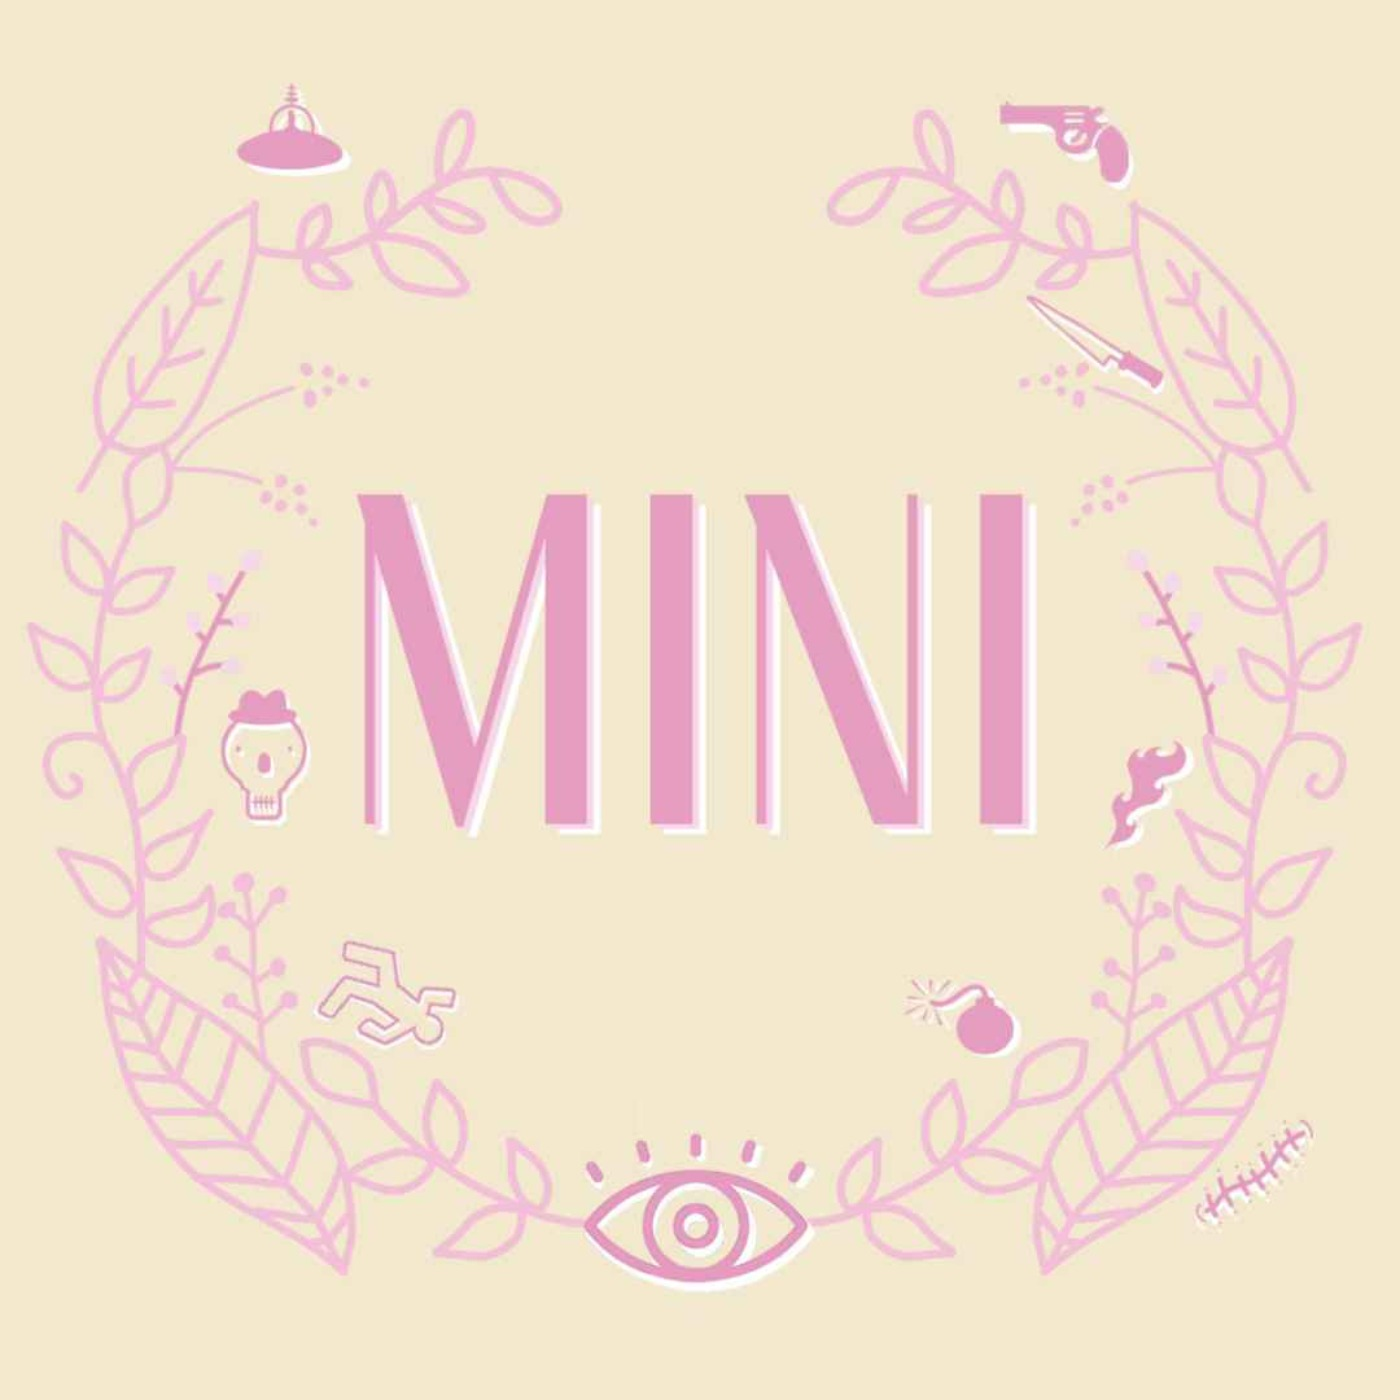 Mini 4: Alexis Goggins